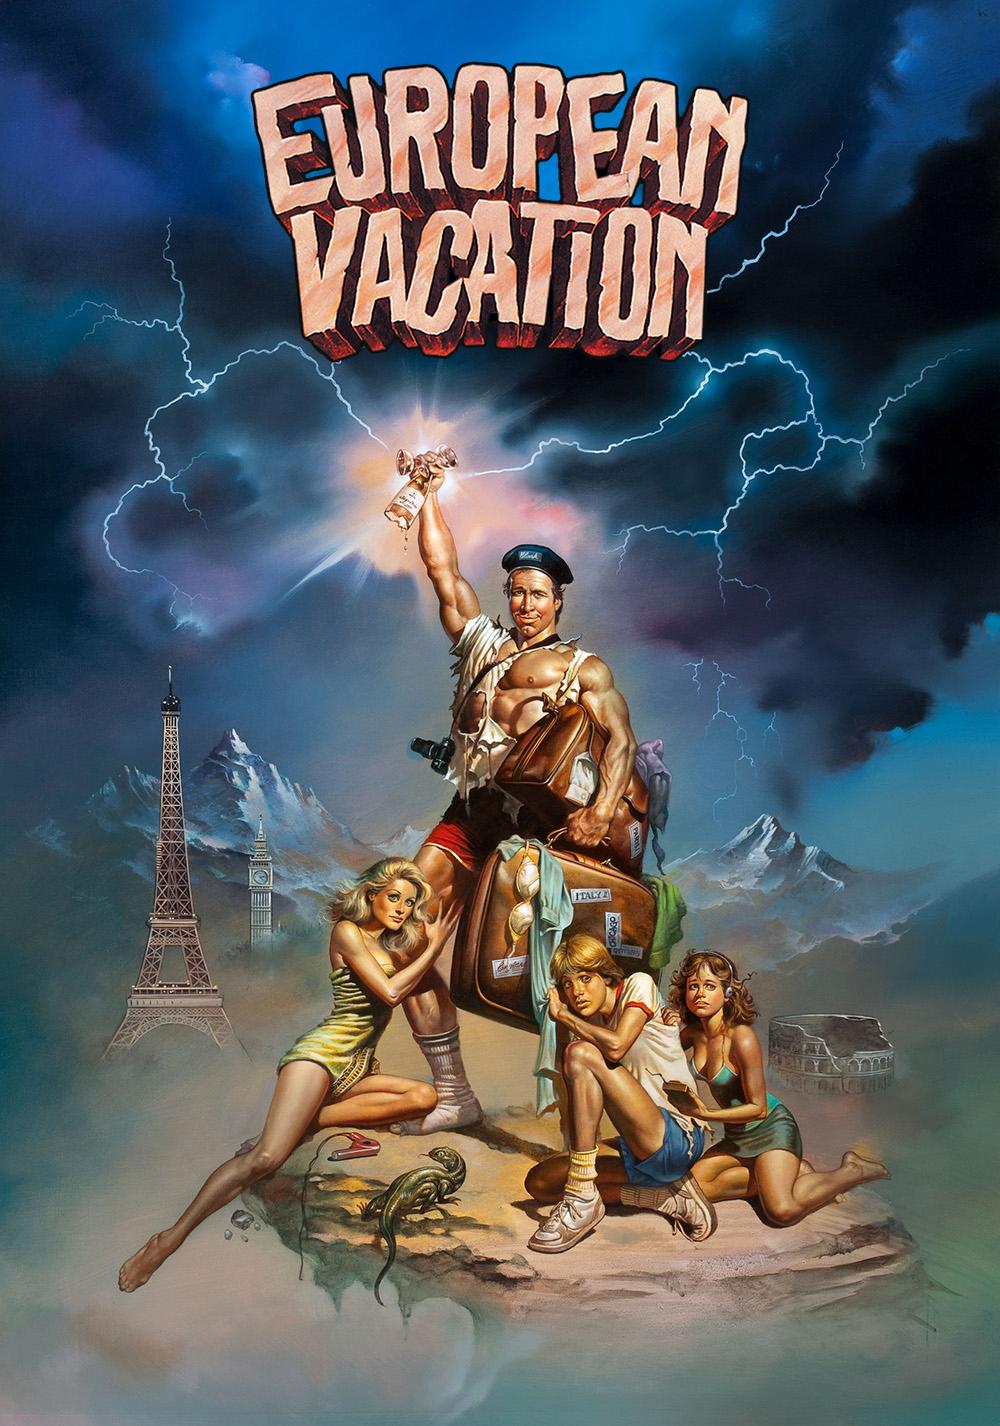 european-vacation-5600e545423fe.jpg